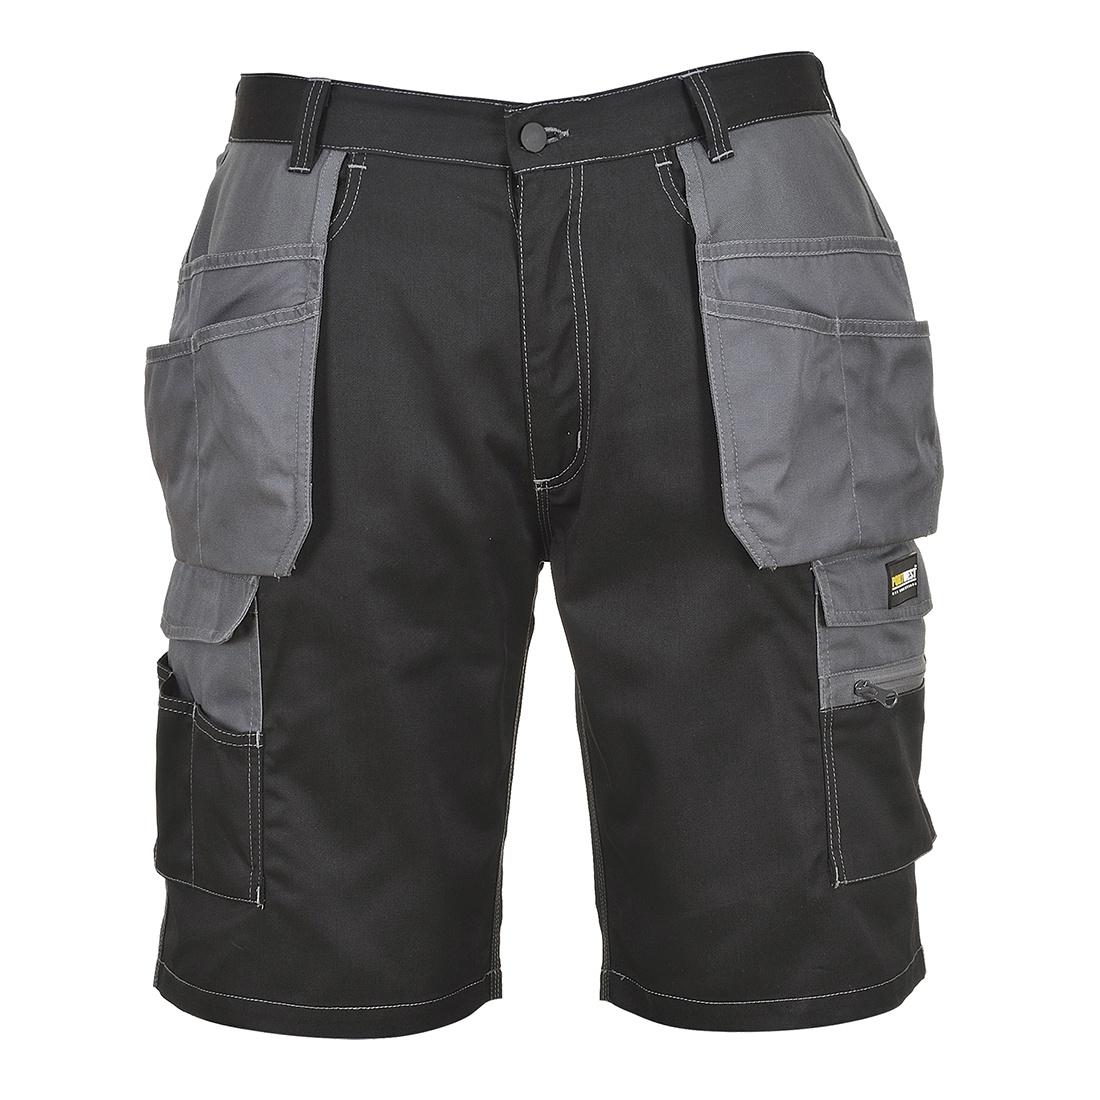 Portwest Granite Holster Shorts - Black/Zoom Grey